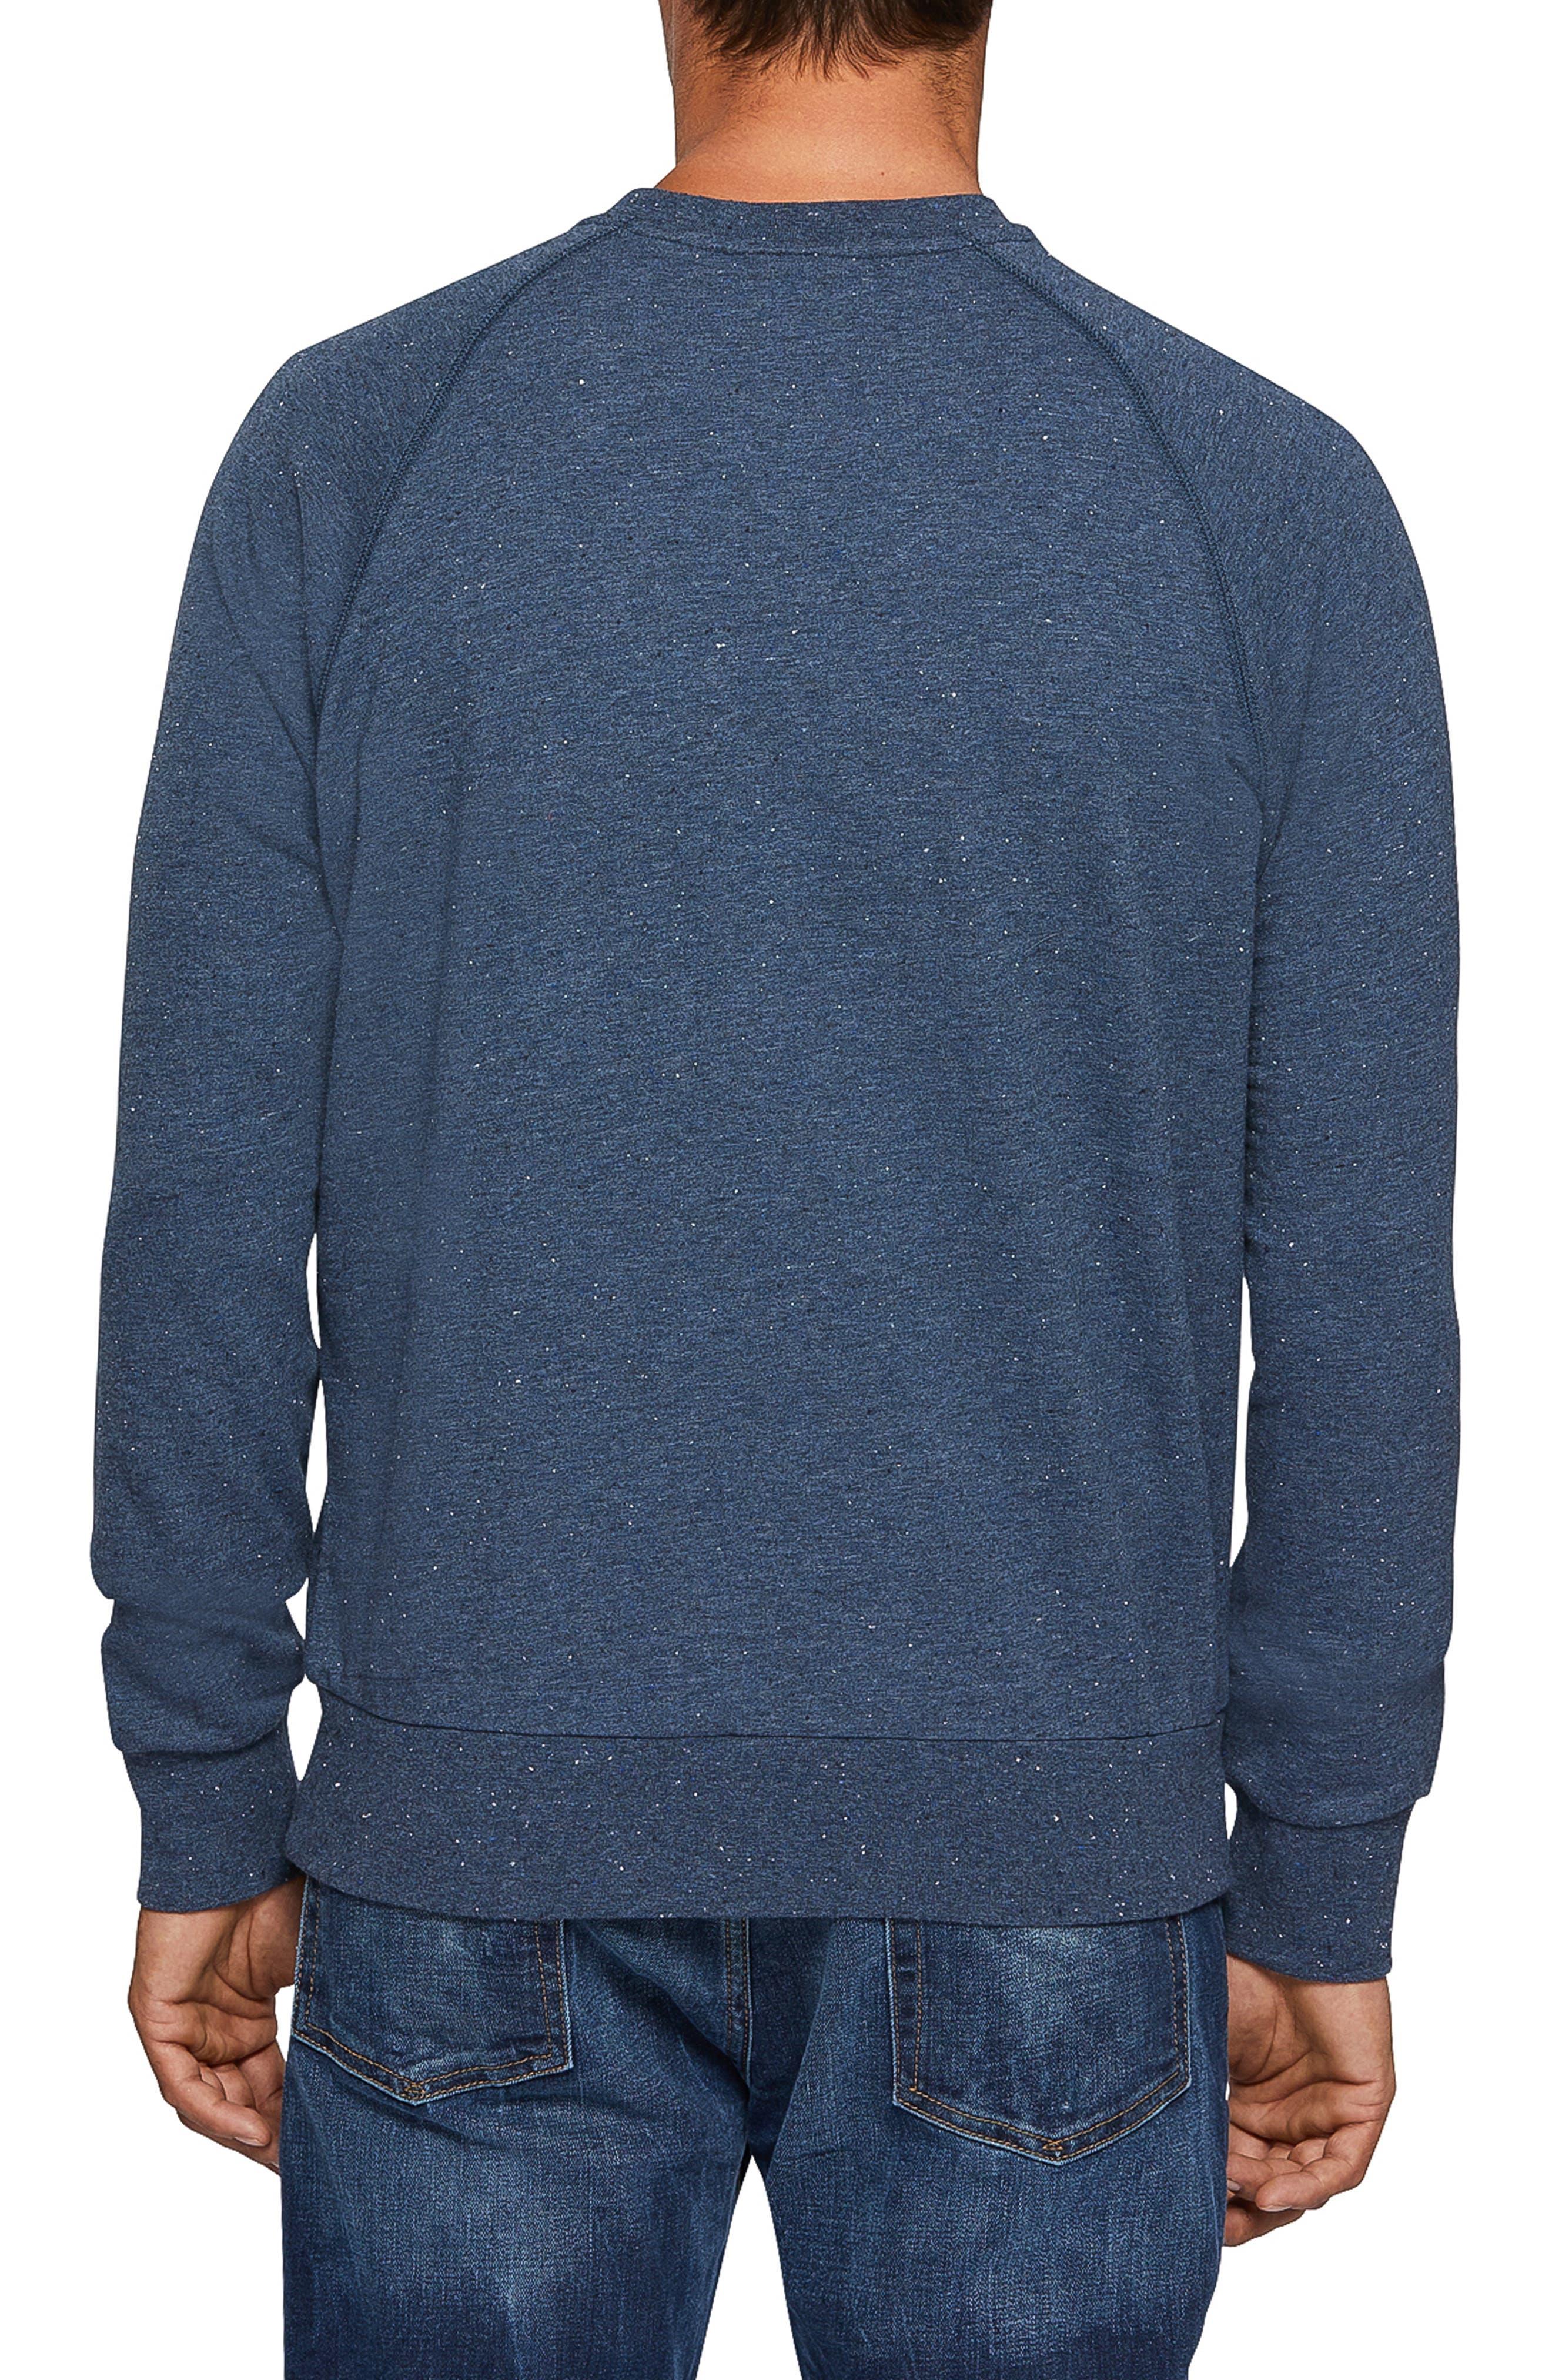 Larne Donegal Crewneck Sweatshirt,                             Alternate thumbnail 2, color,                             GULF